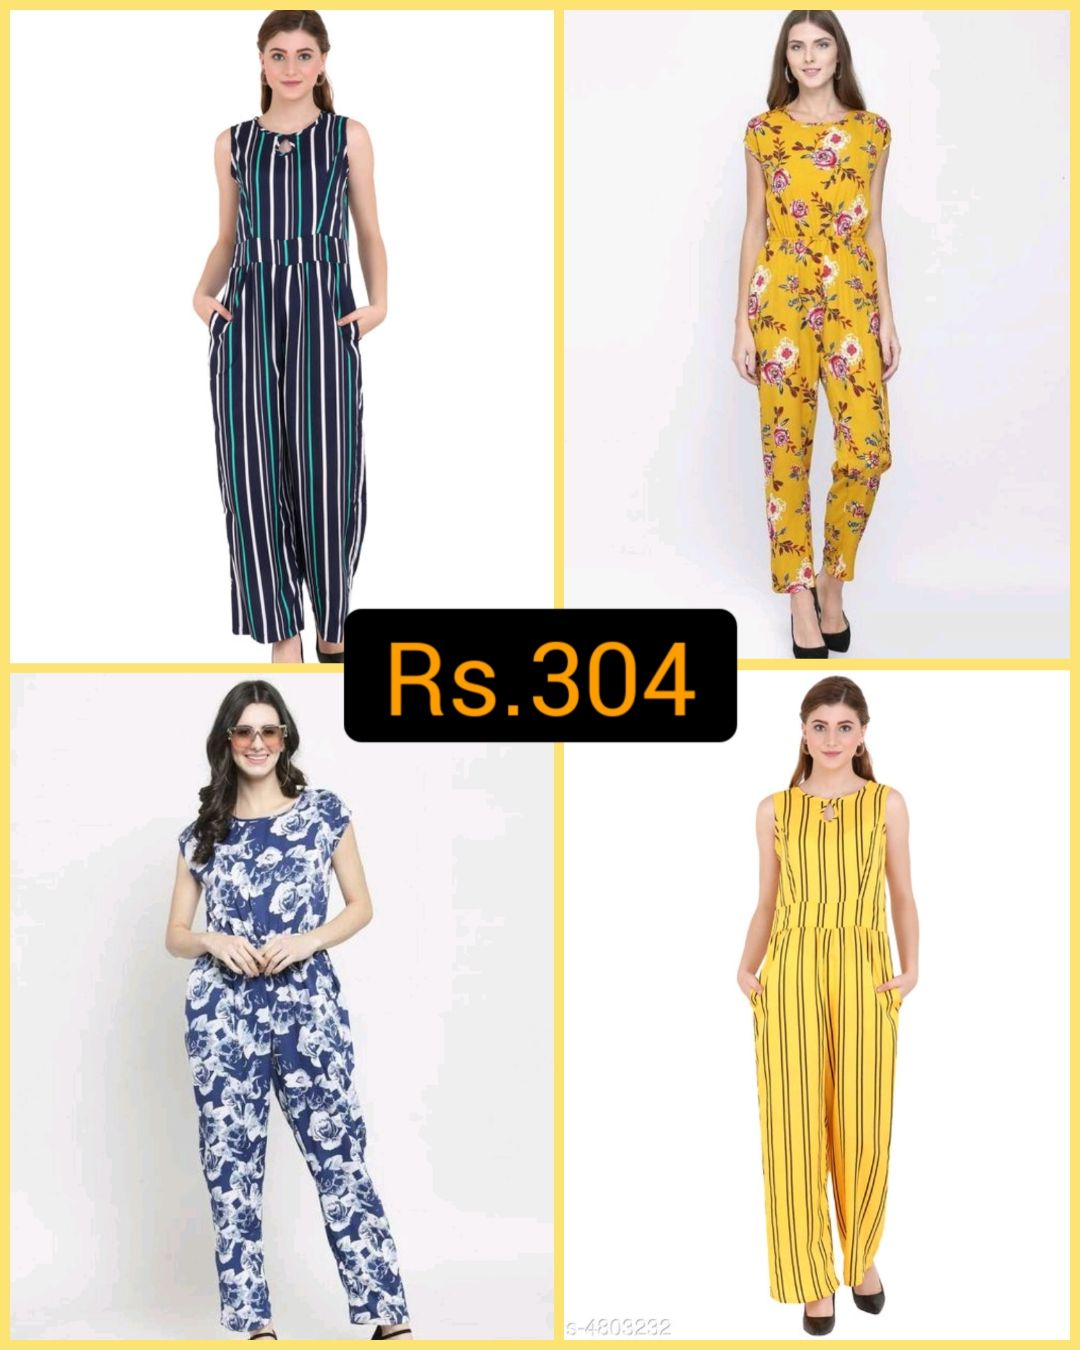 👕यूथ फैशन - Rs . 304 5 - 4809232 - ShareChat